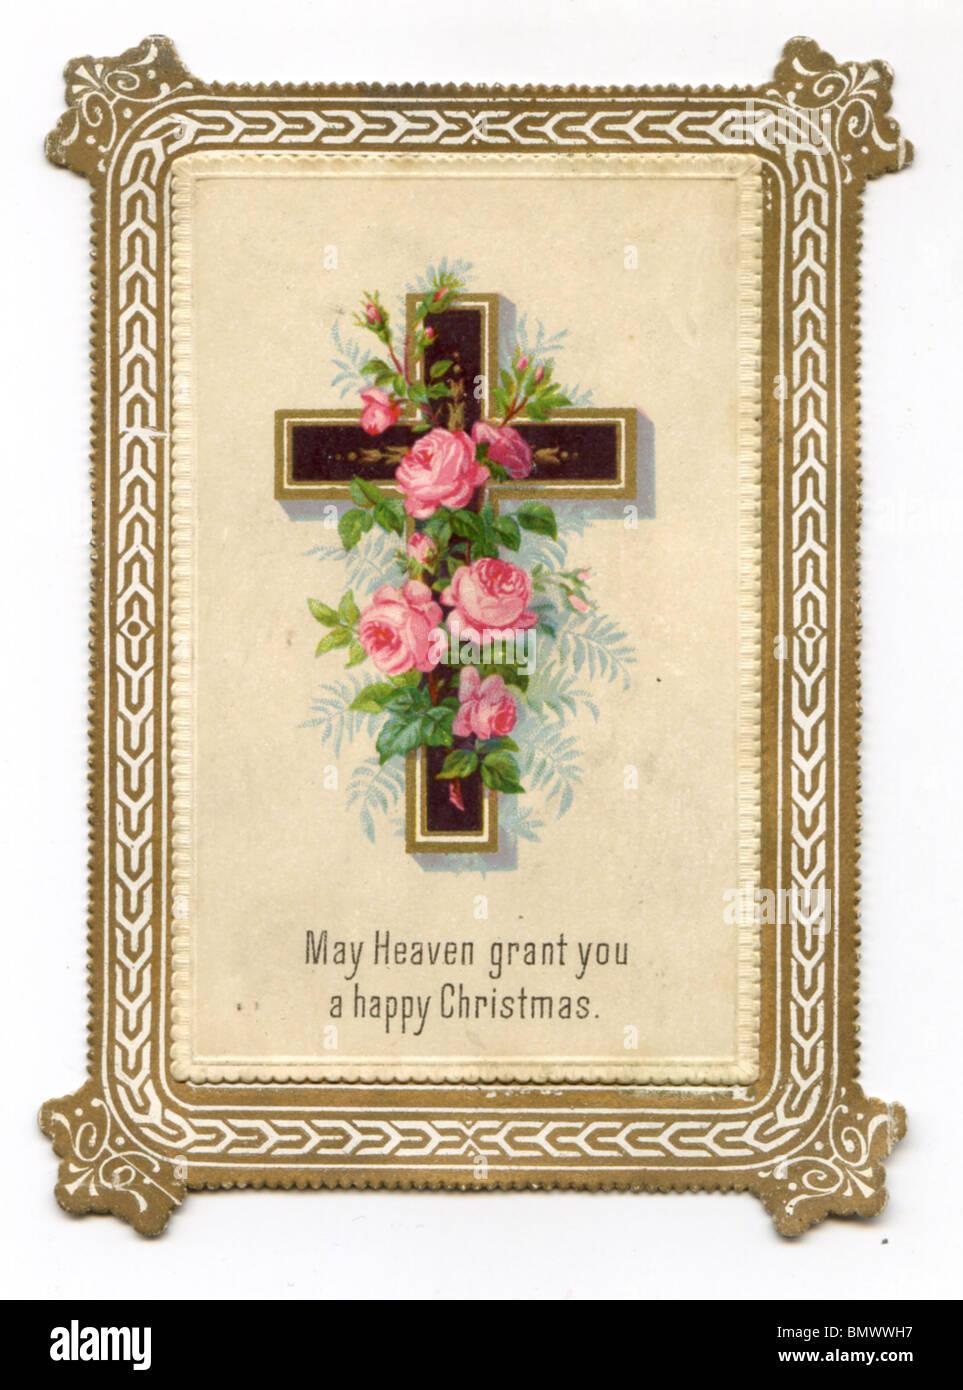 Christian christmas card stock photos christian christmas card christmas card cross and roses stock image m4hsunfo